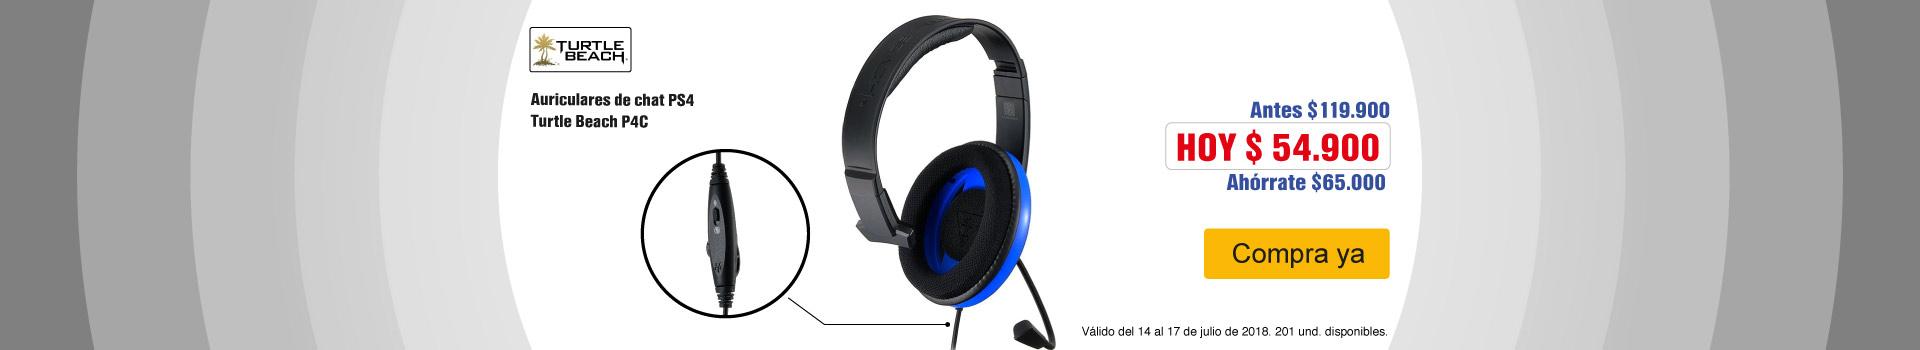 AK-KT-BCAT-6-videojuegos-PP---audifonos-turttlenbeach-jul14